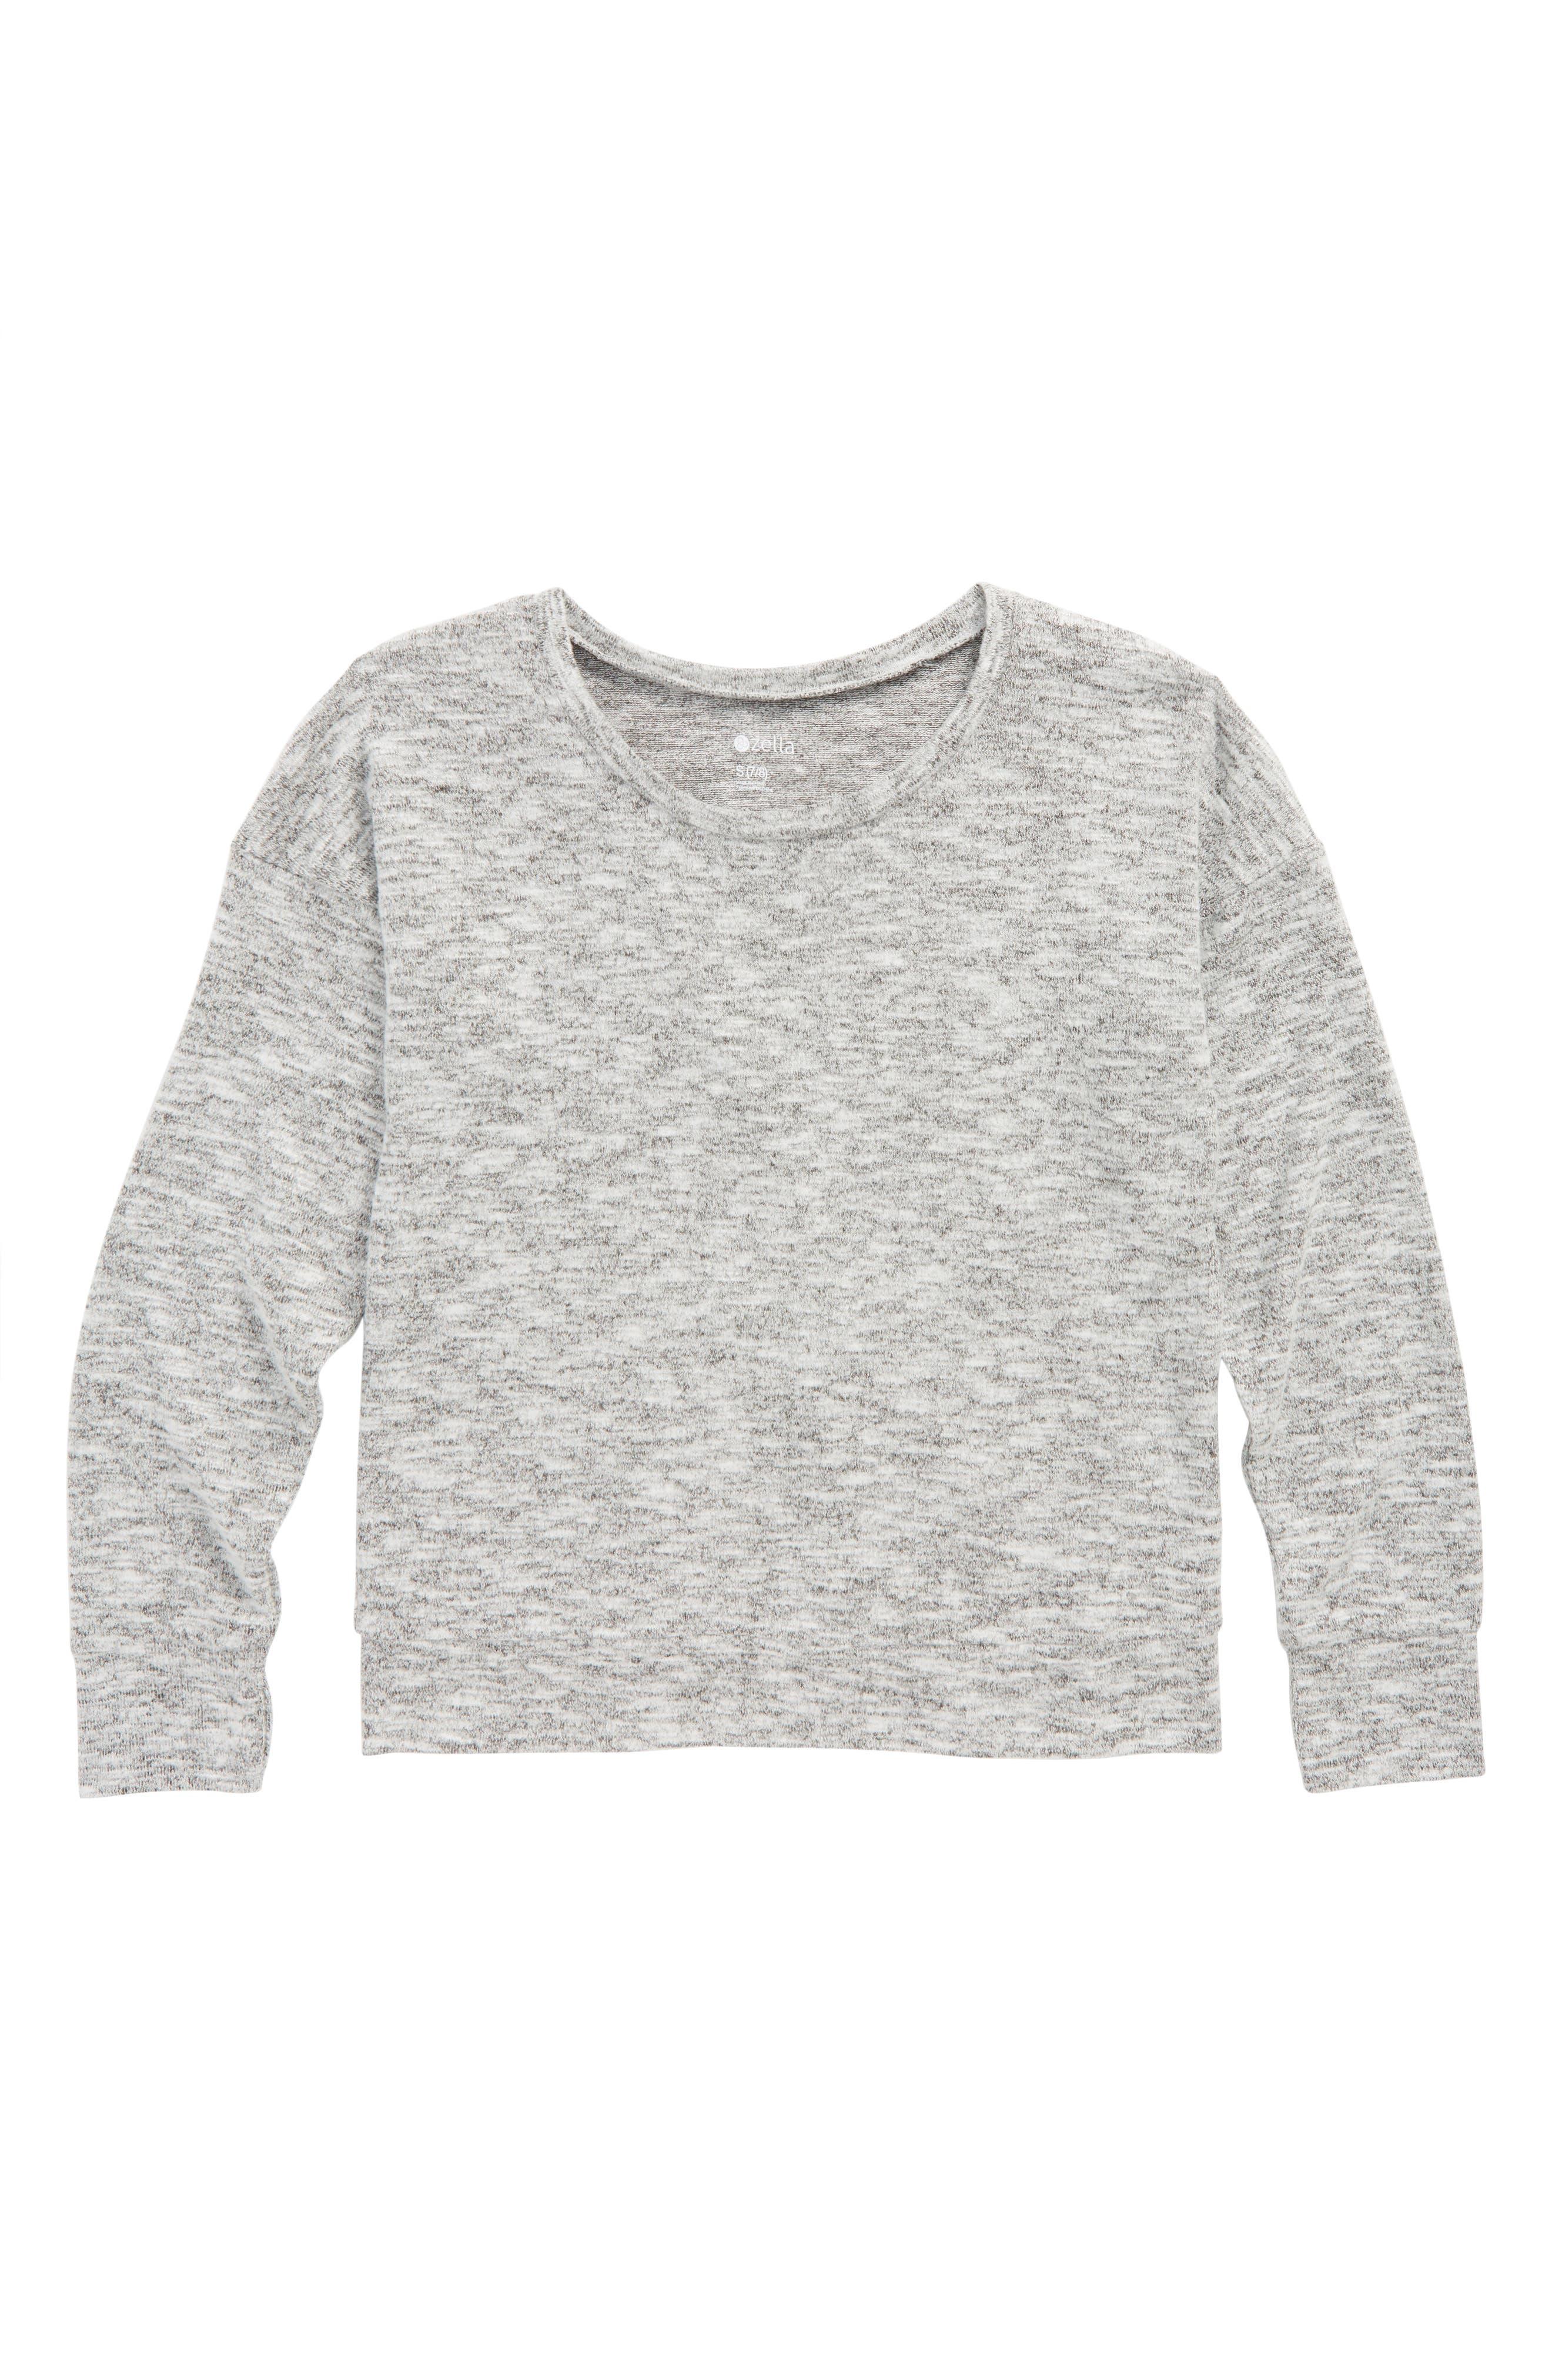 Zella Open Back Sweater,                         Main,                         color, 001